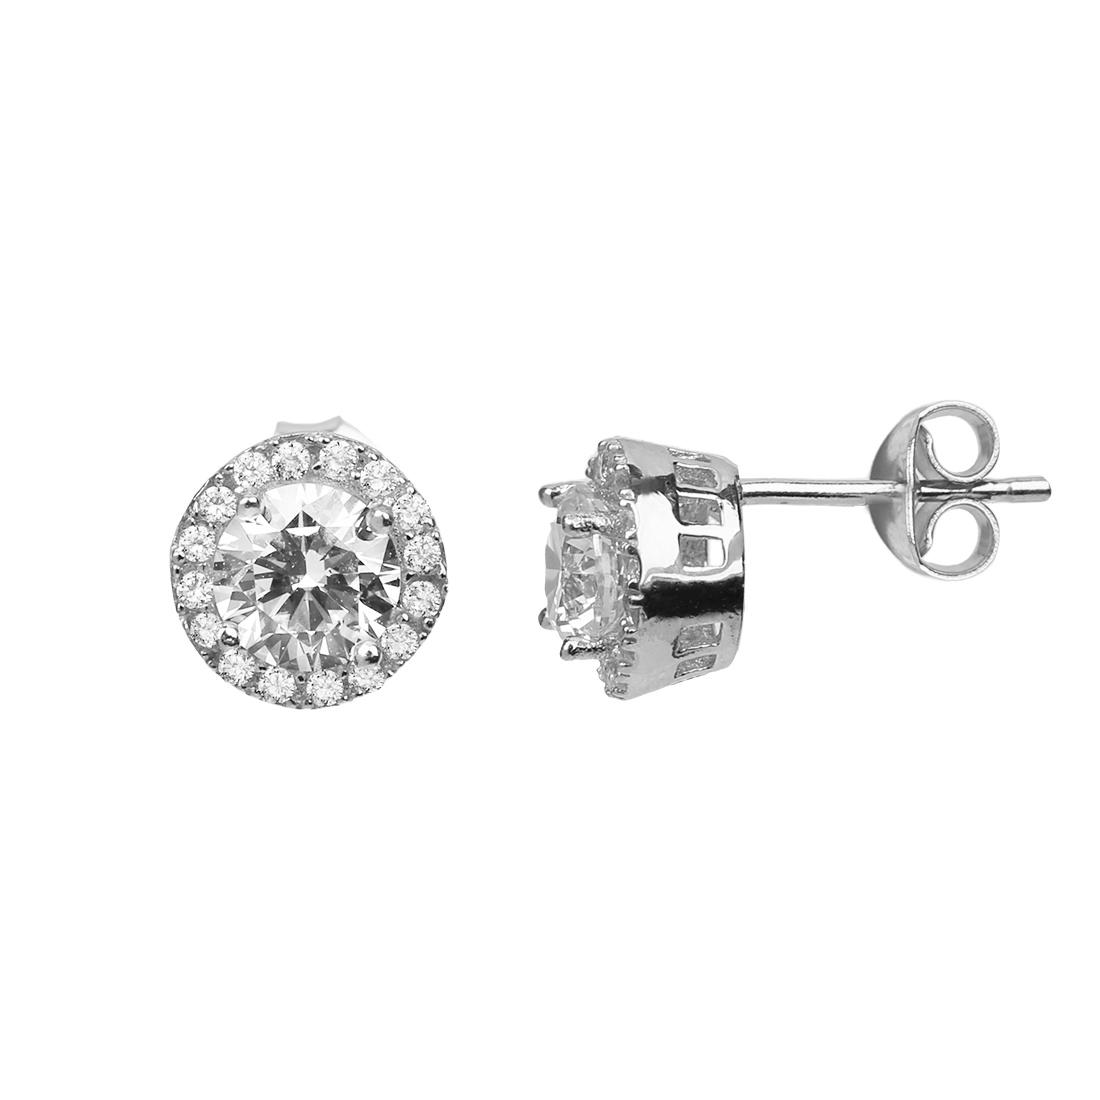 Classic Silver Earring - High Street Jewelry